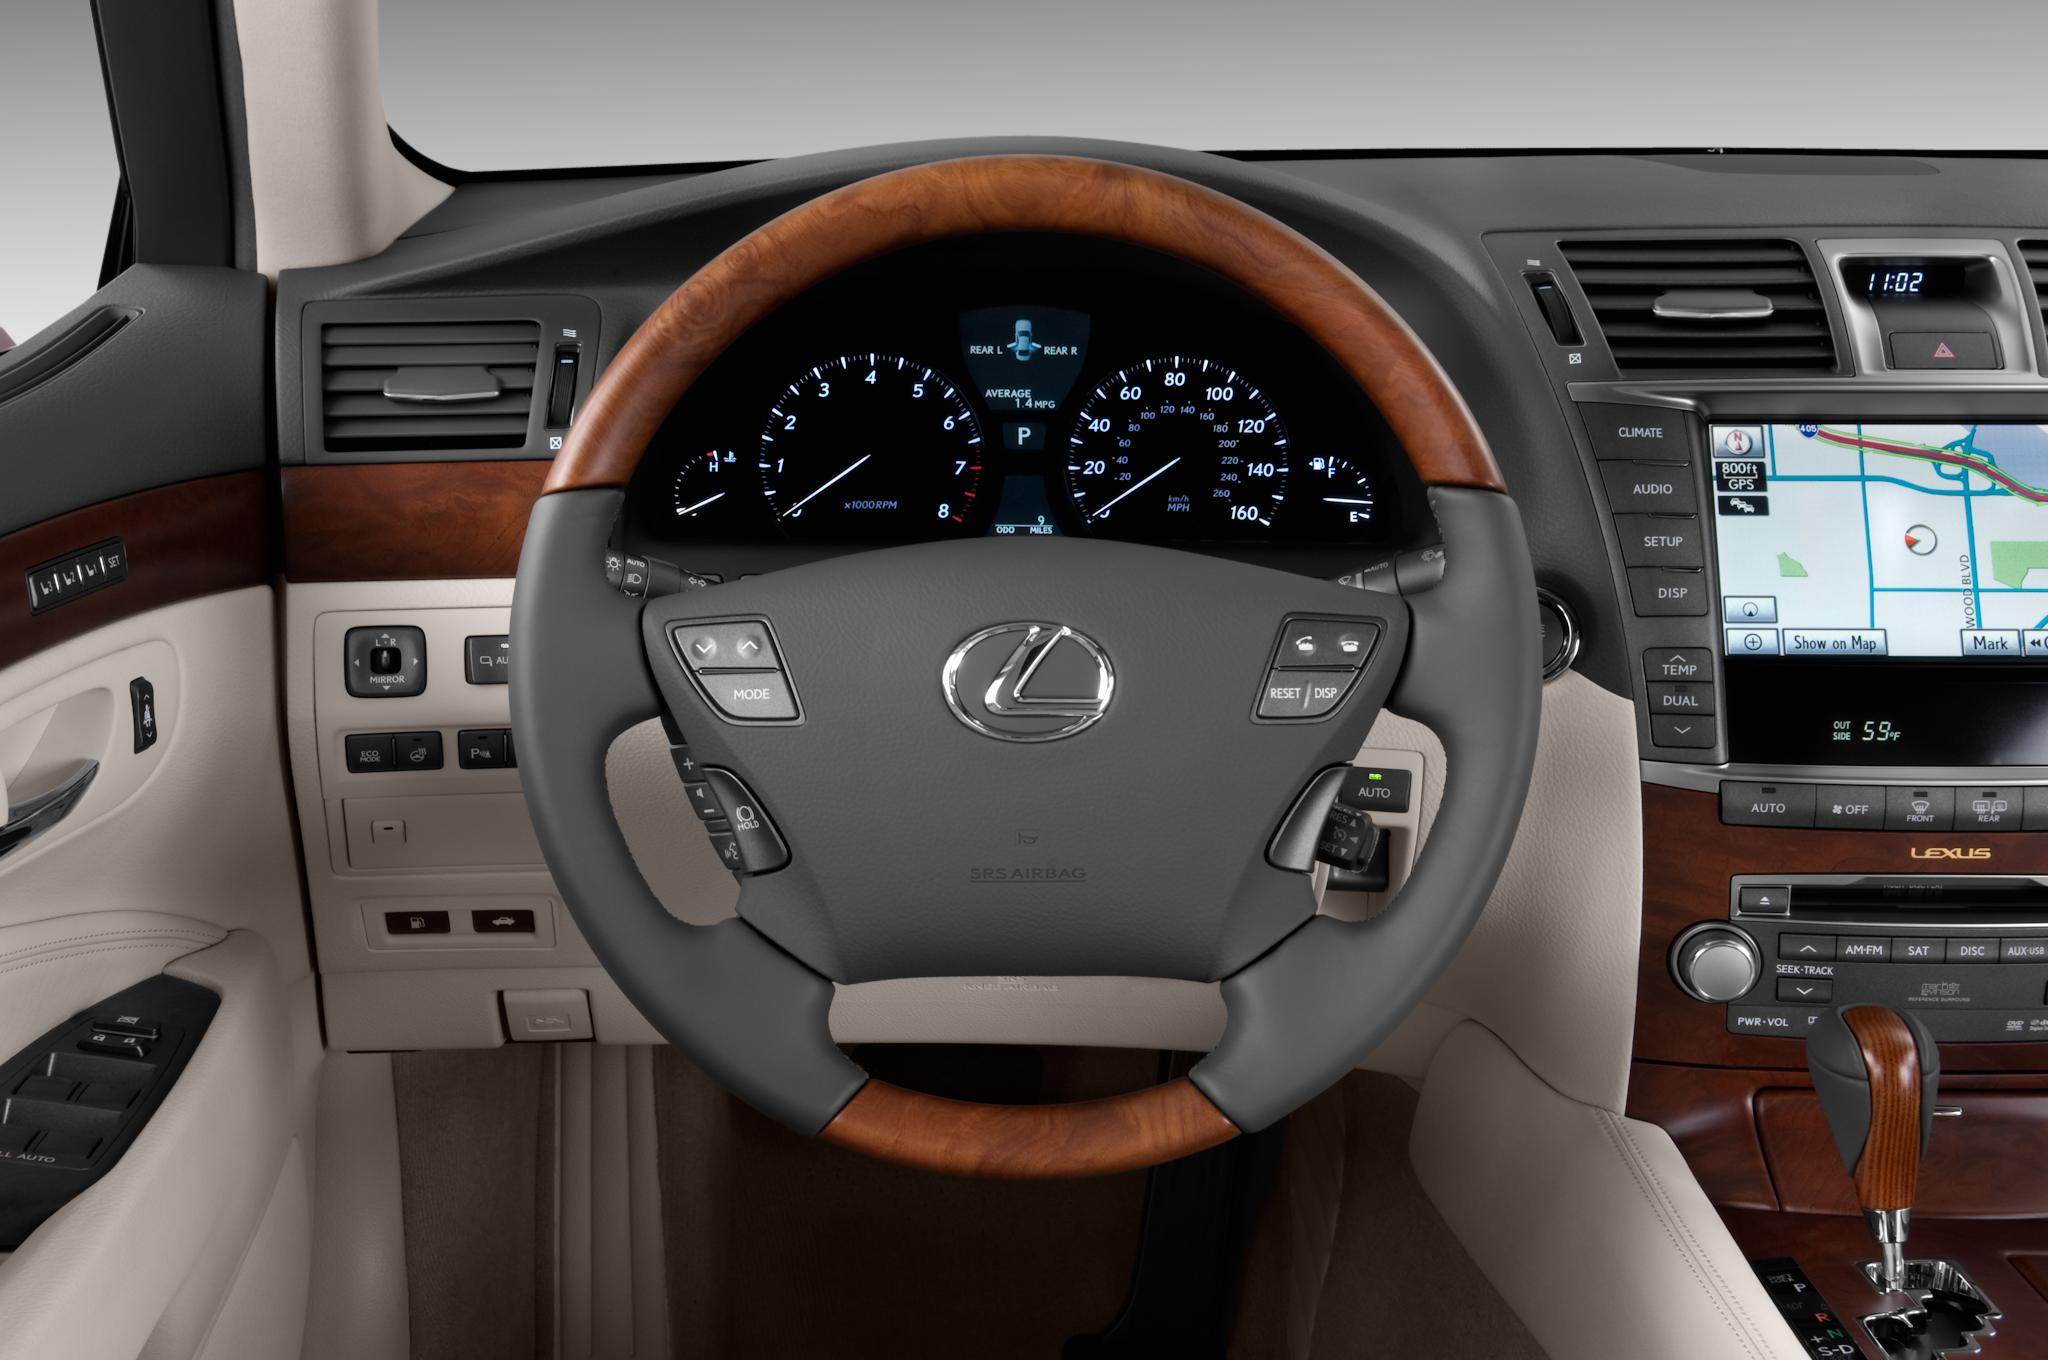 http://st.automobilemag.com/uploads/sites/10/2015/11/2010-lexus-ls-460-l-sedan-steering-wheel.png